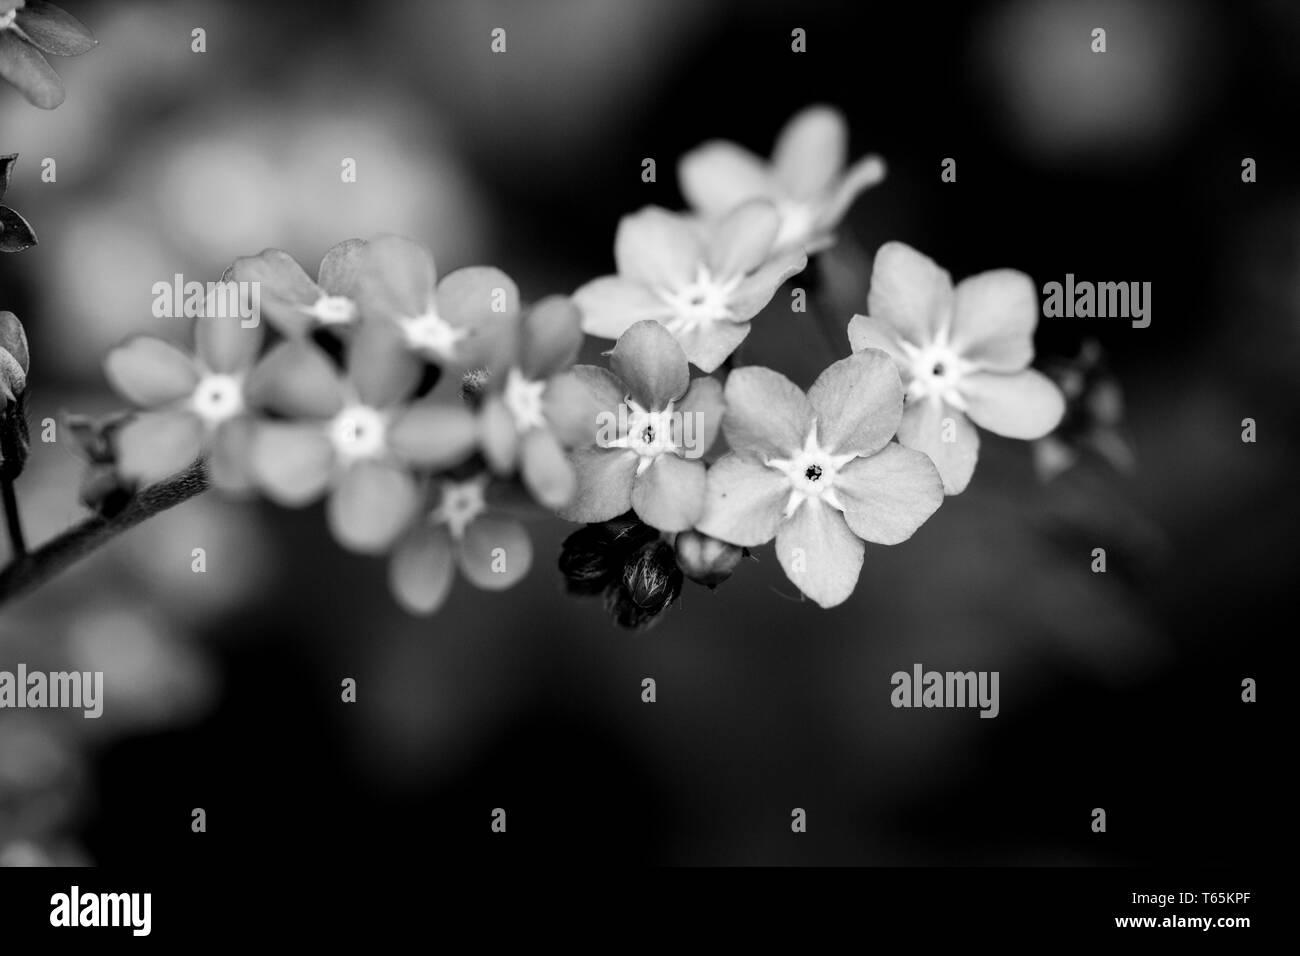 Black-white photo of myosotis flowers. Macro photography. Stock Photo